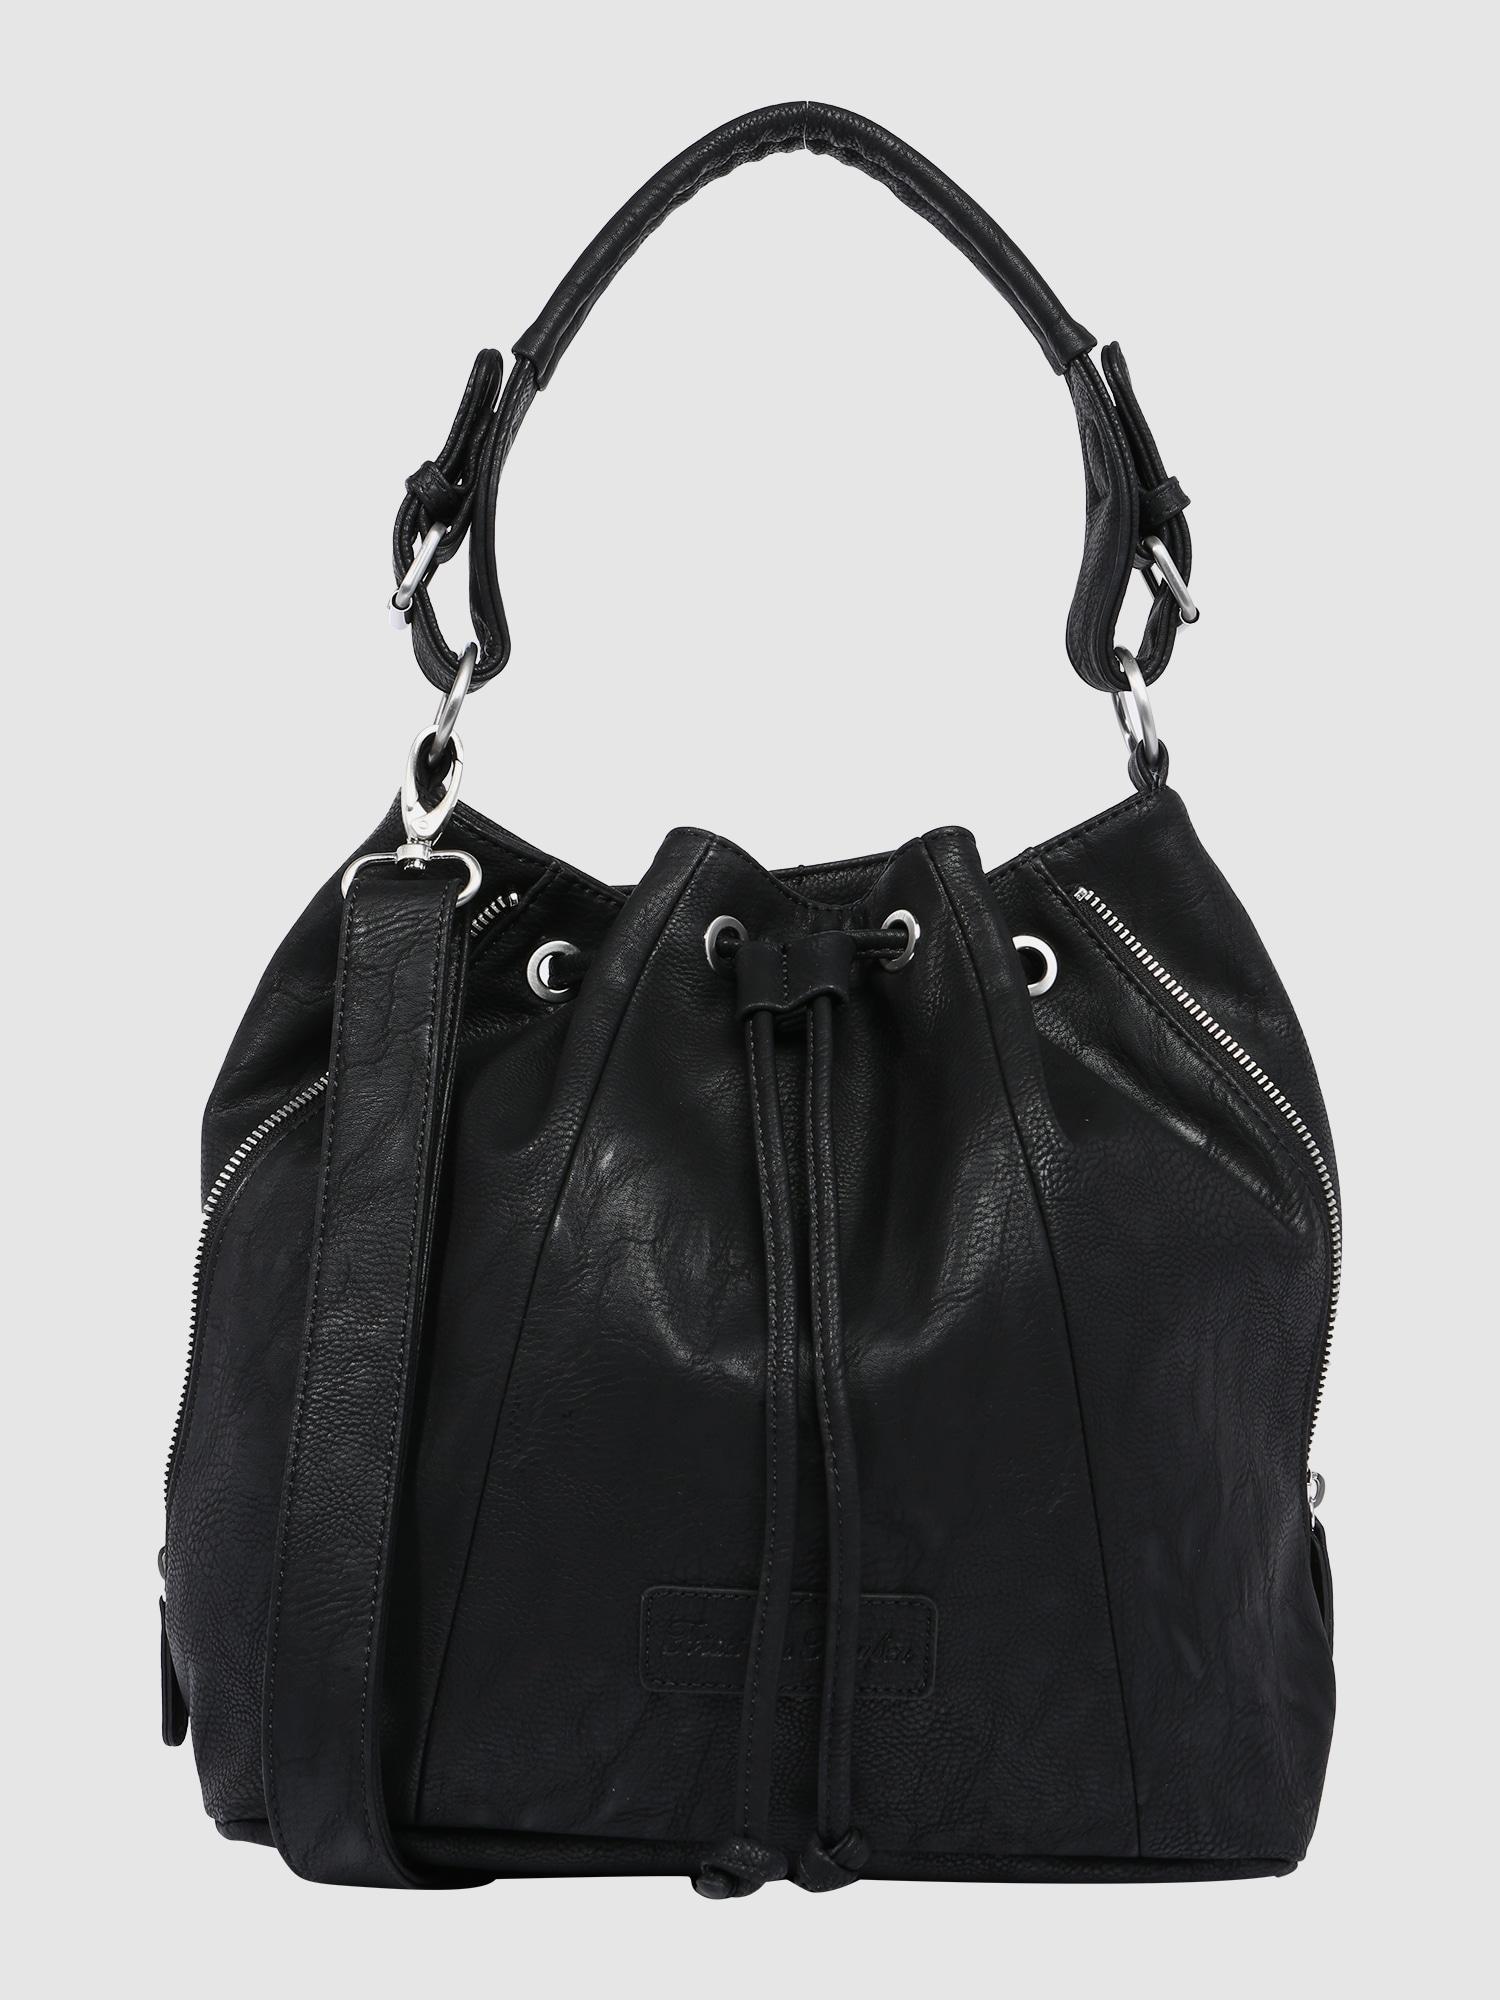 fritzi aus preu en yuna handtasche in schwarz about you. Black Bedroom Furniture Sets. Home Design Ideas